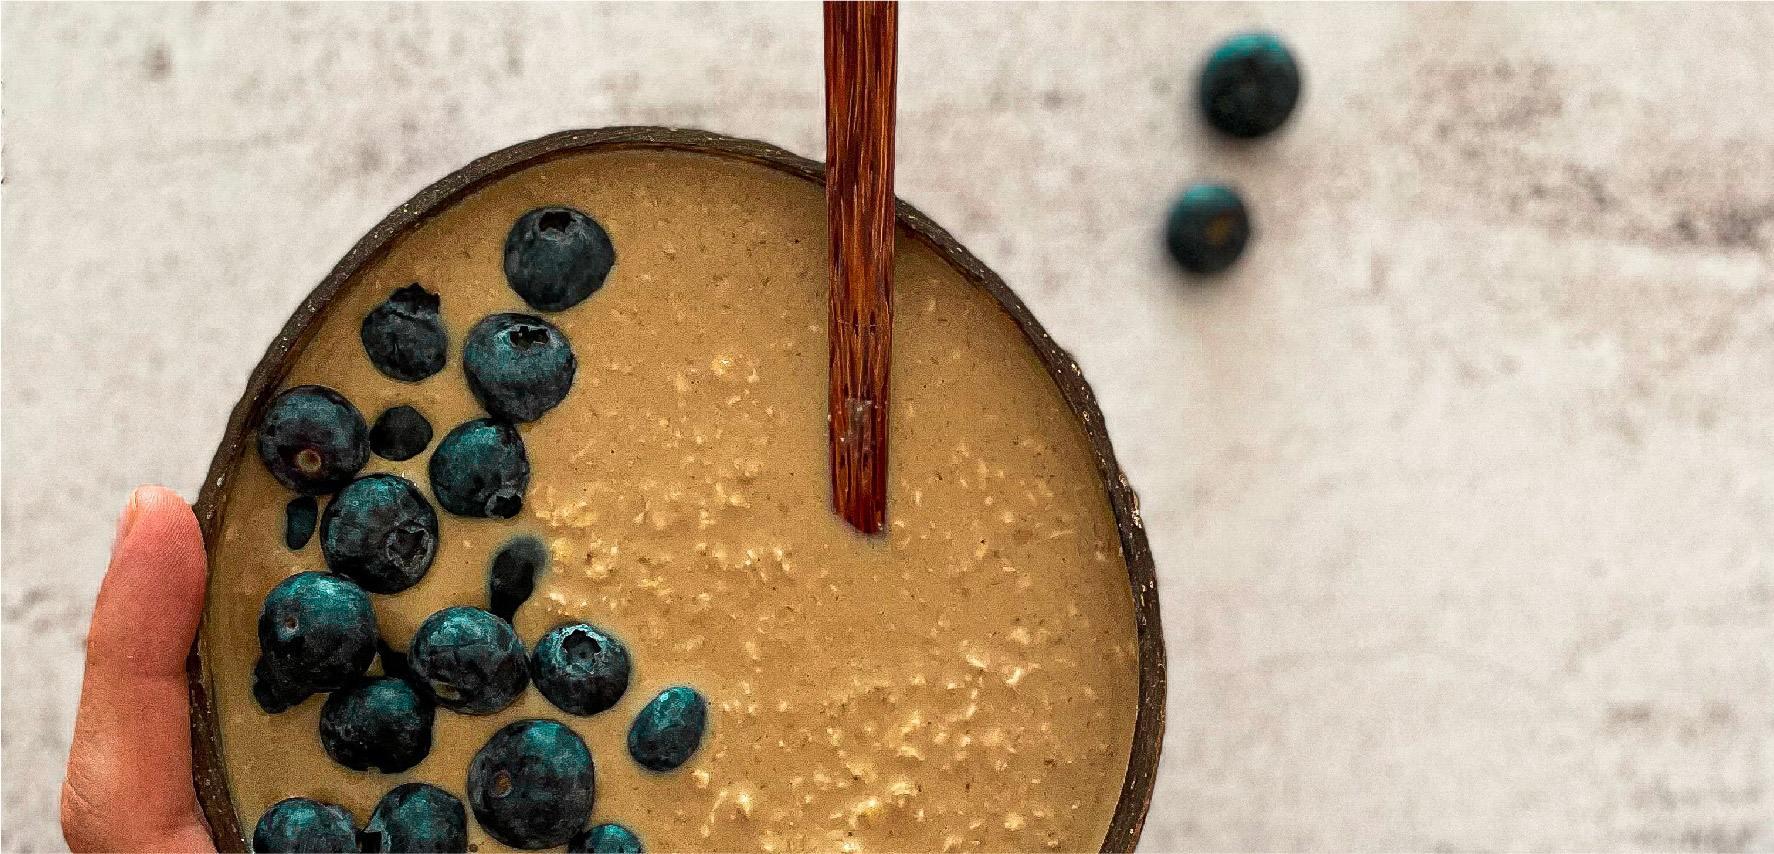 Receta de Porridge de Café y Canela con arándanos azules_Portada